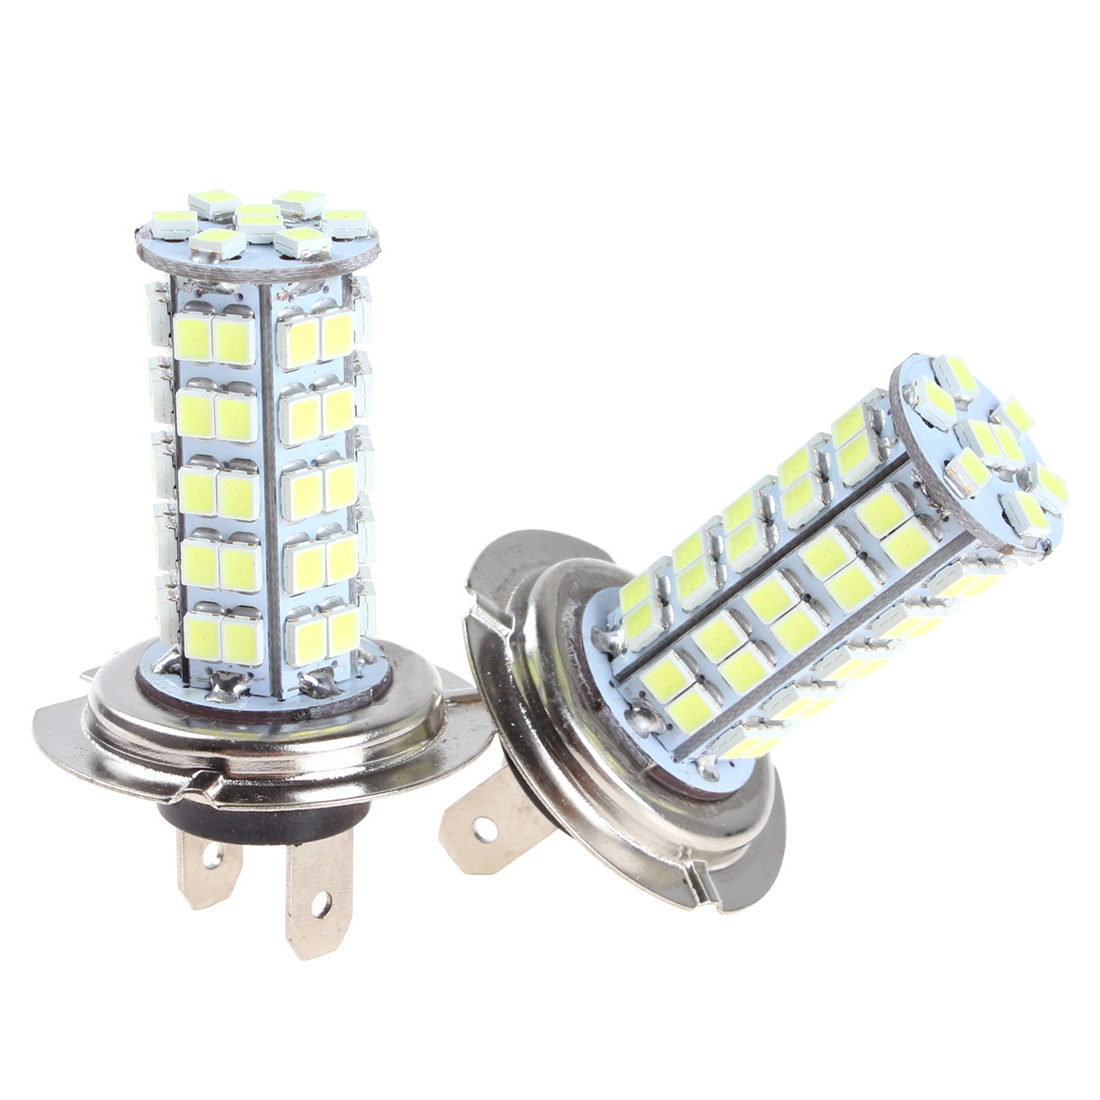 2 Pcs H7 Car Fog Light 68 SMD LEDs Xenon White Bulbs LED Signal Lamp Fit For Bentley / Mercedes / BMW / Audi 12V Vehicle